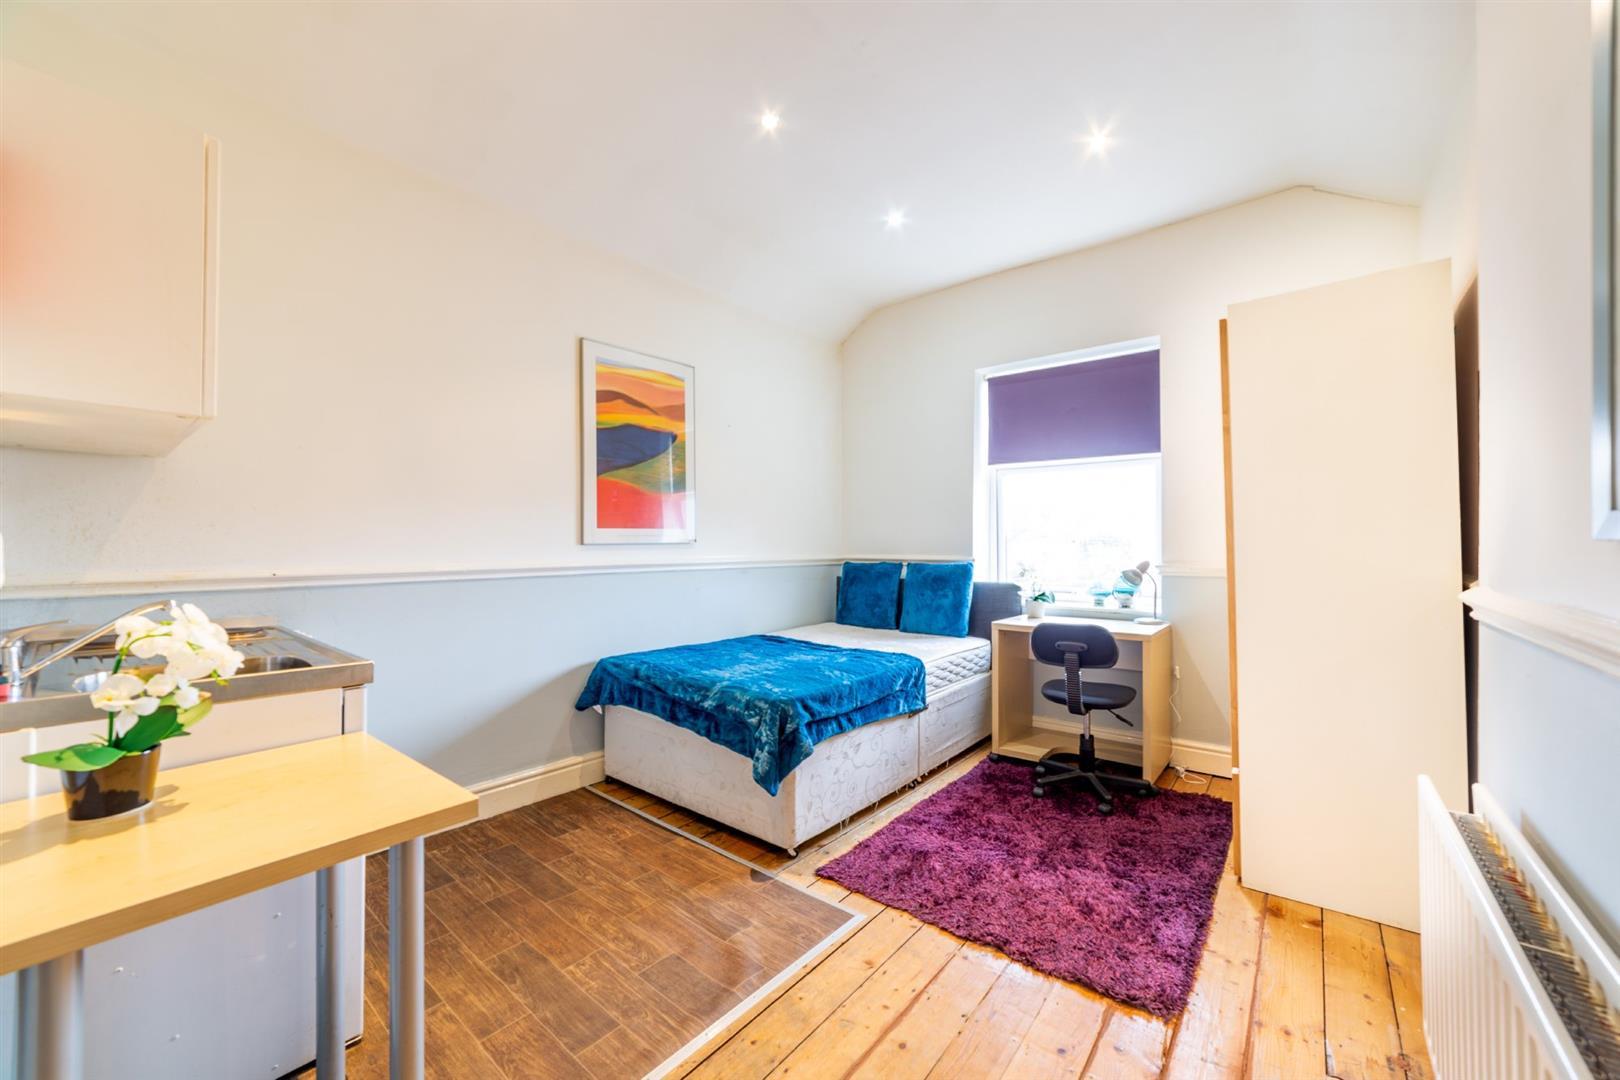 1 bed studio flat to rent in Newcastle Upon Tyne, NE4 6AQ 0